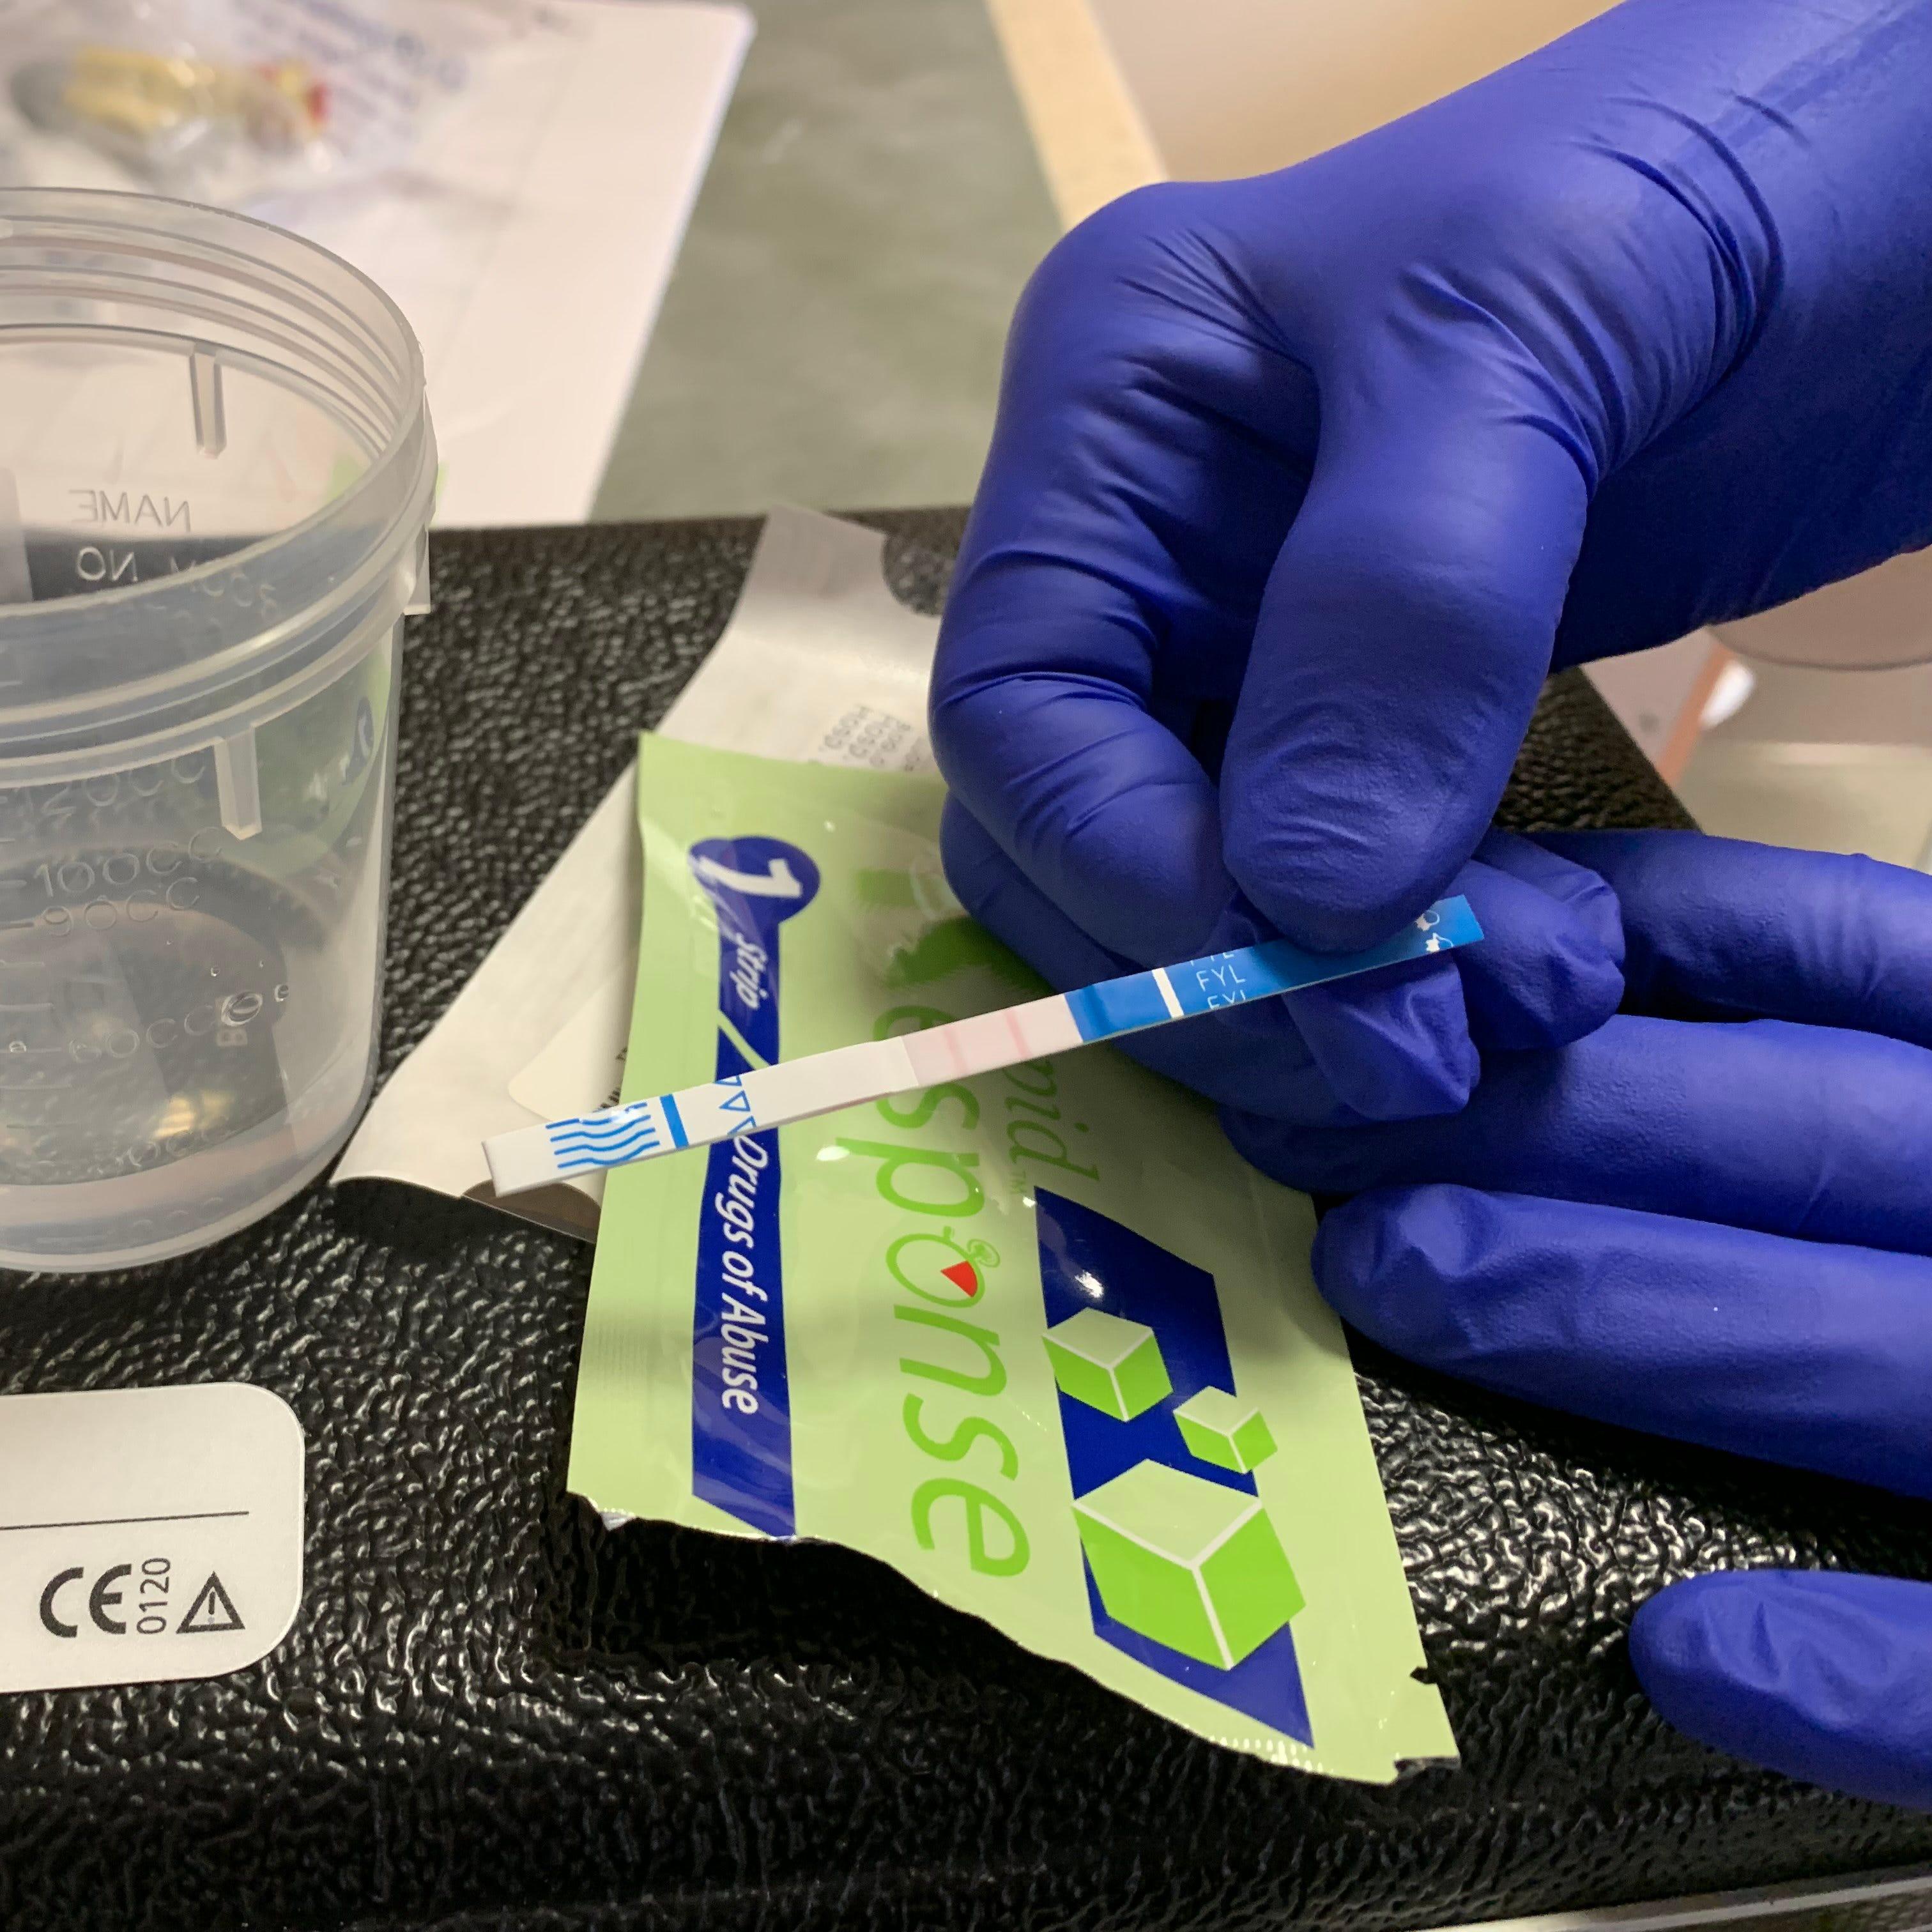 Fentanyl drives Delaware's overdose deaths but drug tests don't screen for it